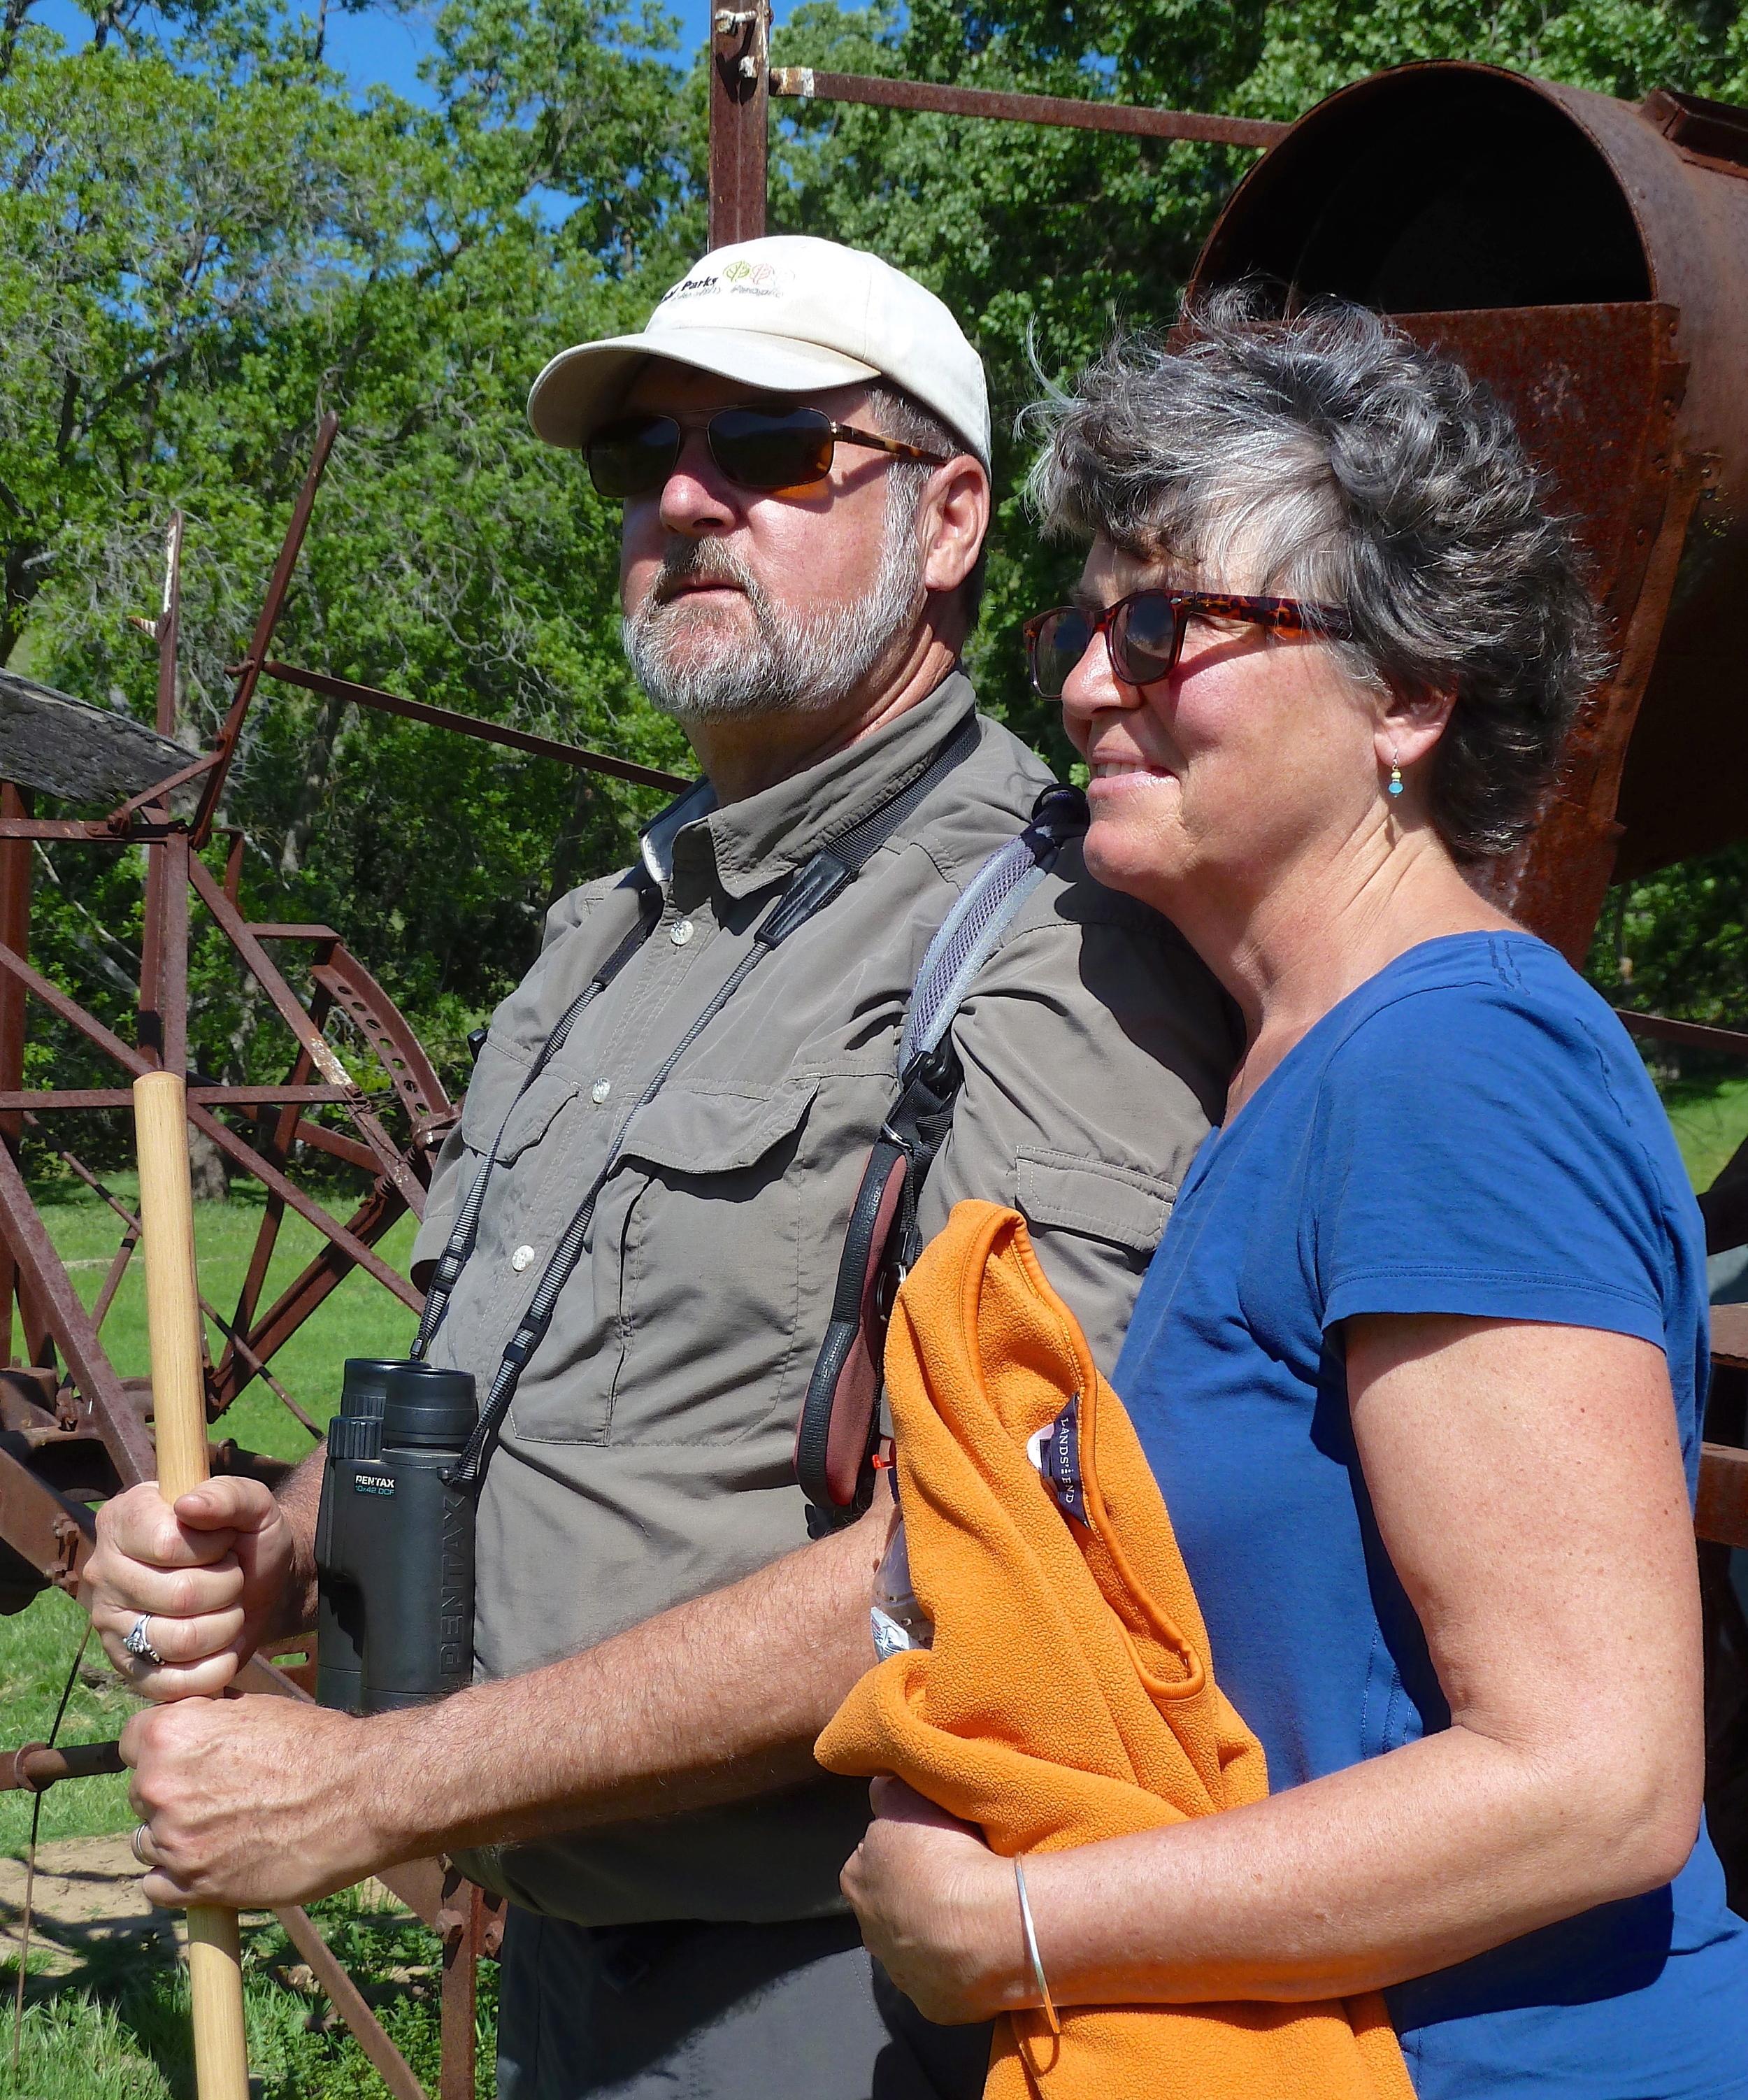 Bob Doyle and Tina Batt soak in the spring sunlight in Murphy Meadow, Round Valley Regional Preserve.